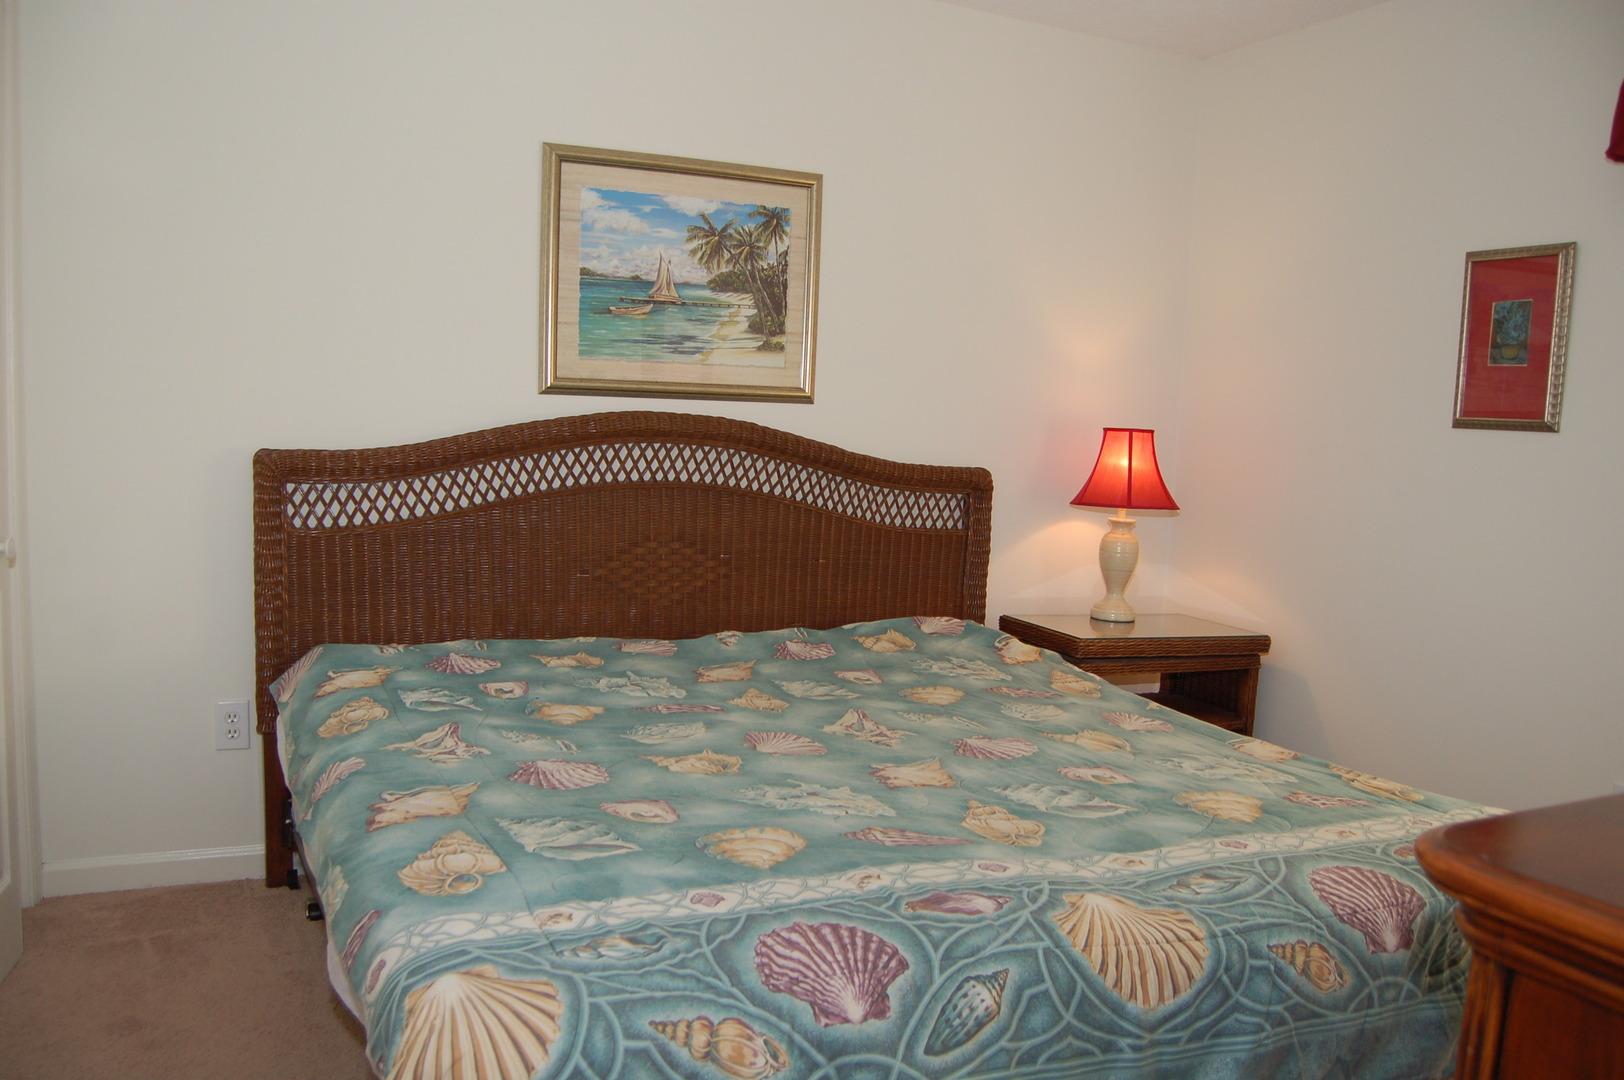 2nd Floor Furnished 1 Bedroom Condo In River Oaks Long Term Rental